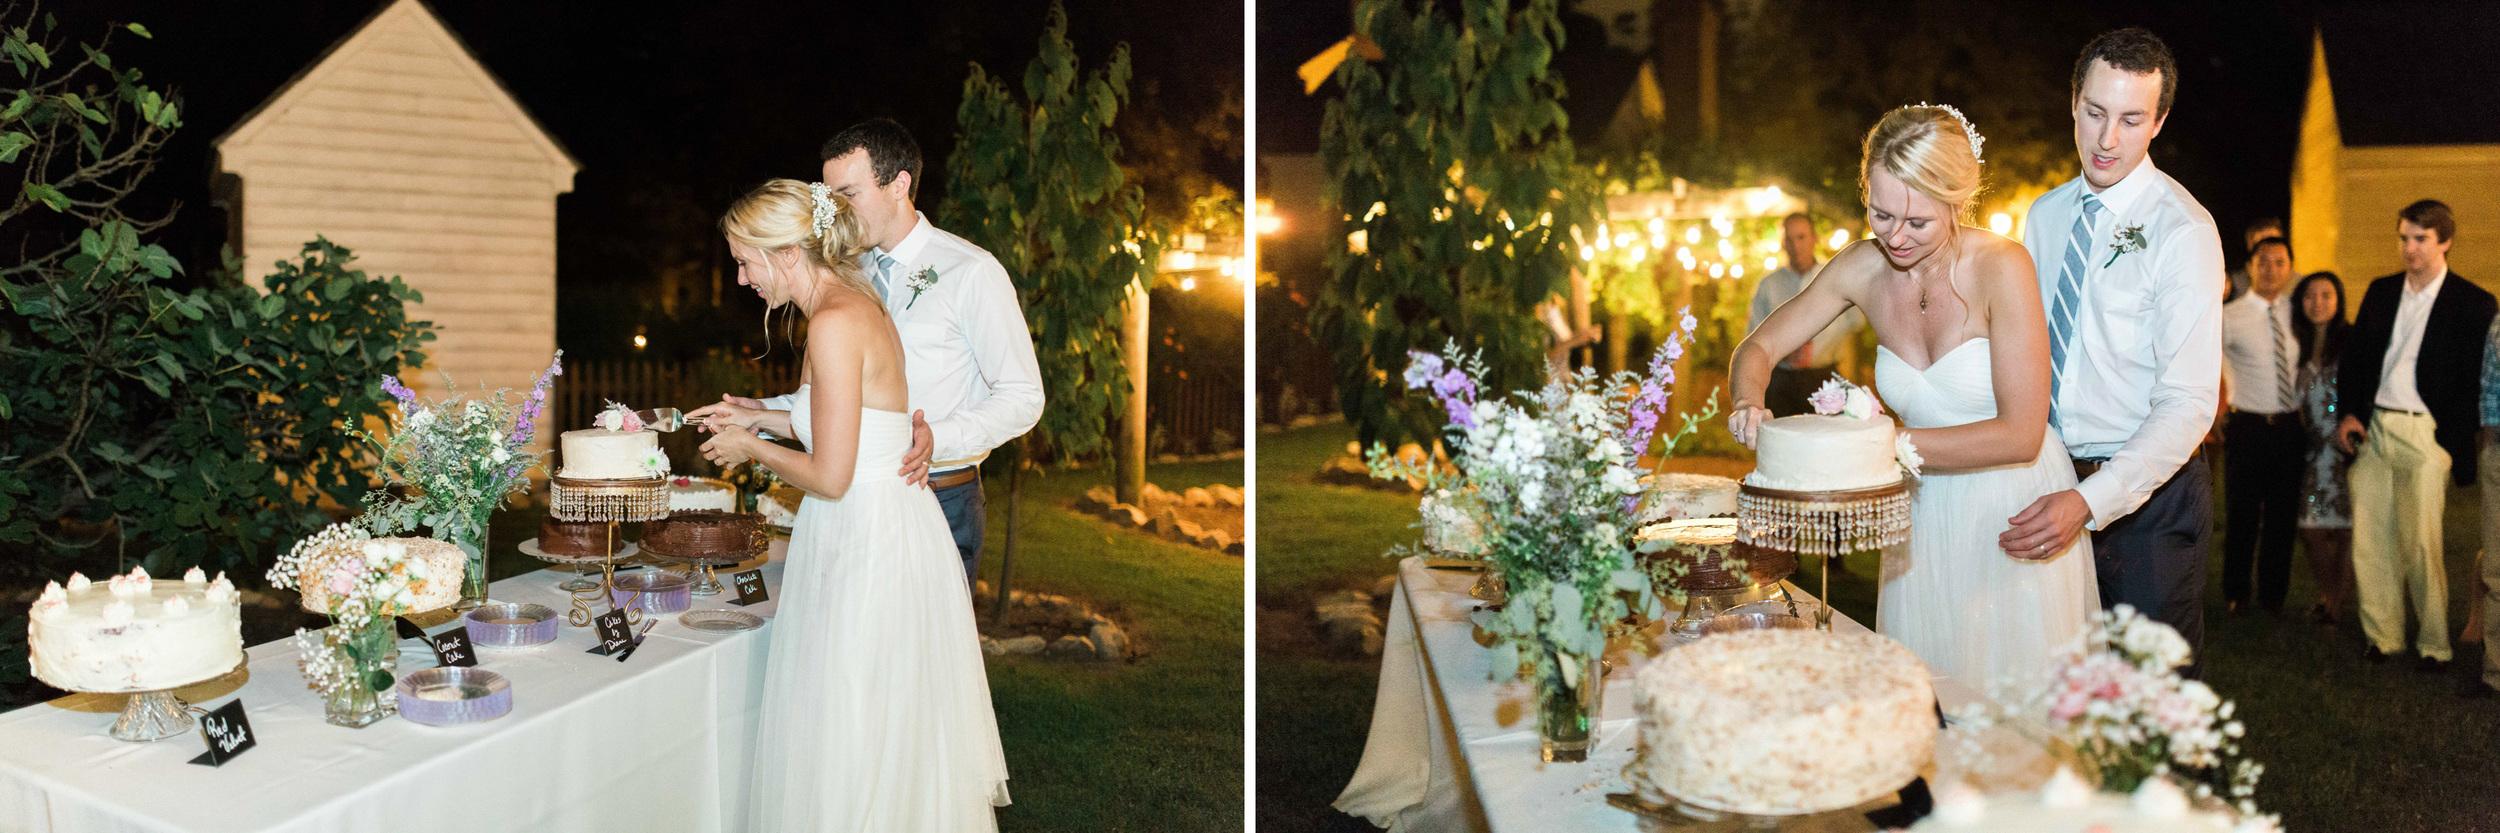 Mordecai House Wedding in Raleigh, NC // www.kristalajara.com